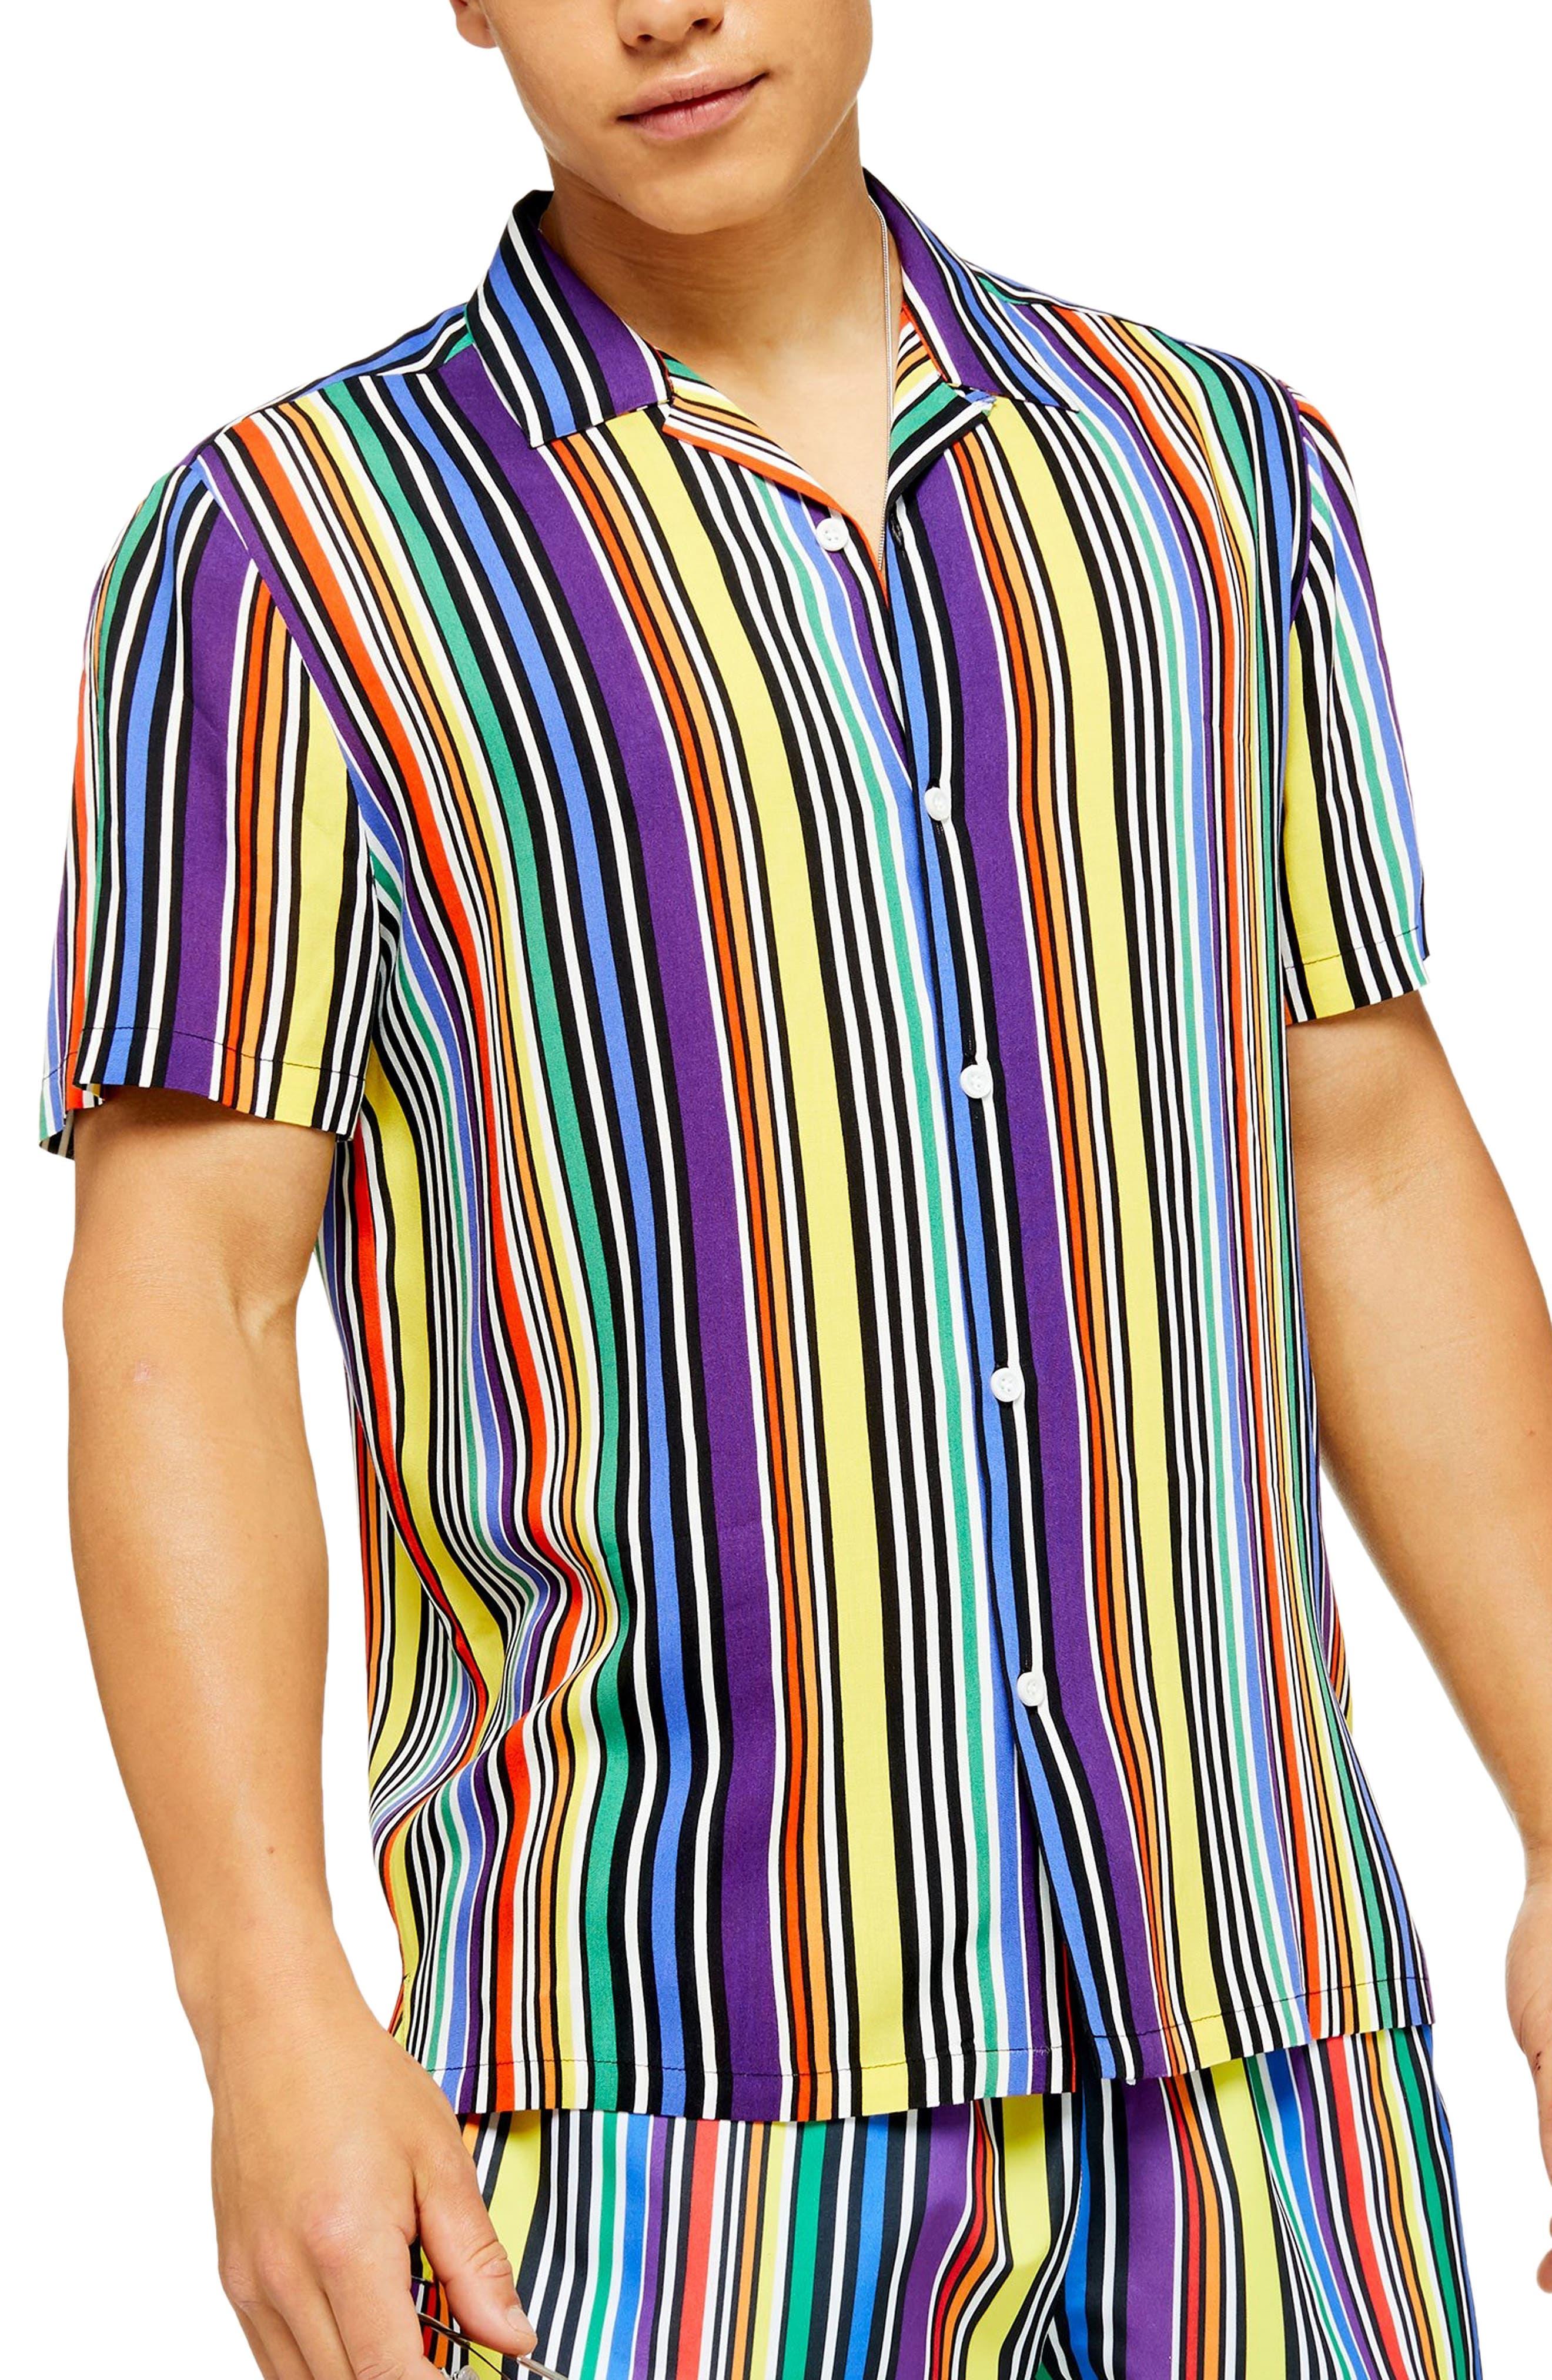 1960s – 70s Mens Shirts- Disco Shirts, Hippie Shirts Mens Topman Regular Fit Stripe Short Sleeve Button-Up Camp Shirt Size X-Small - Yellow $45.00 AT vintagedancer.com